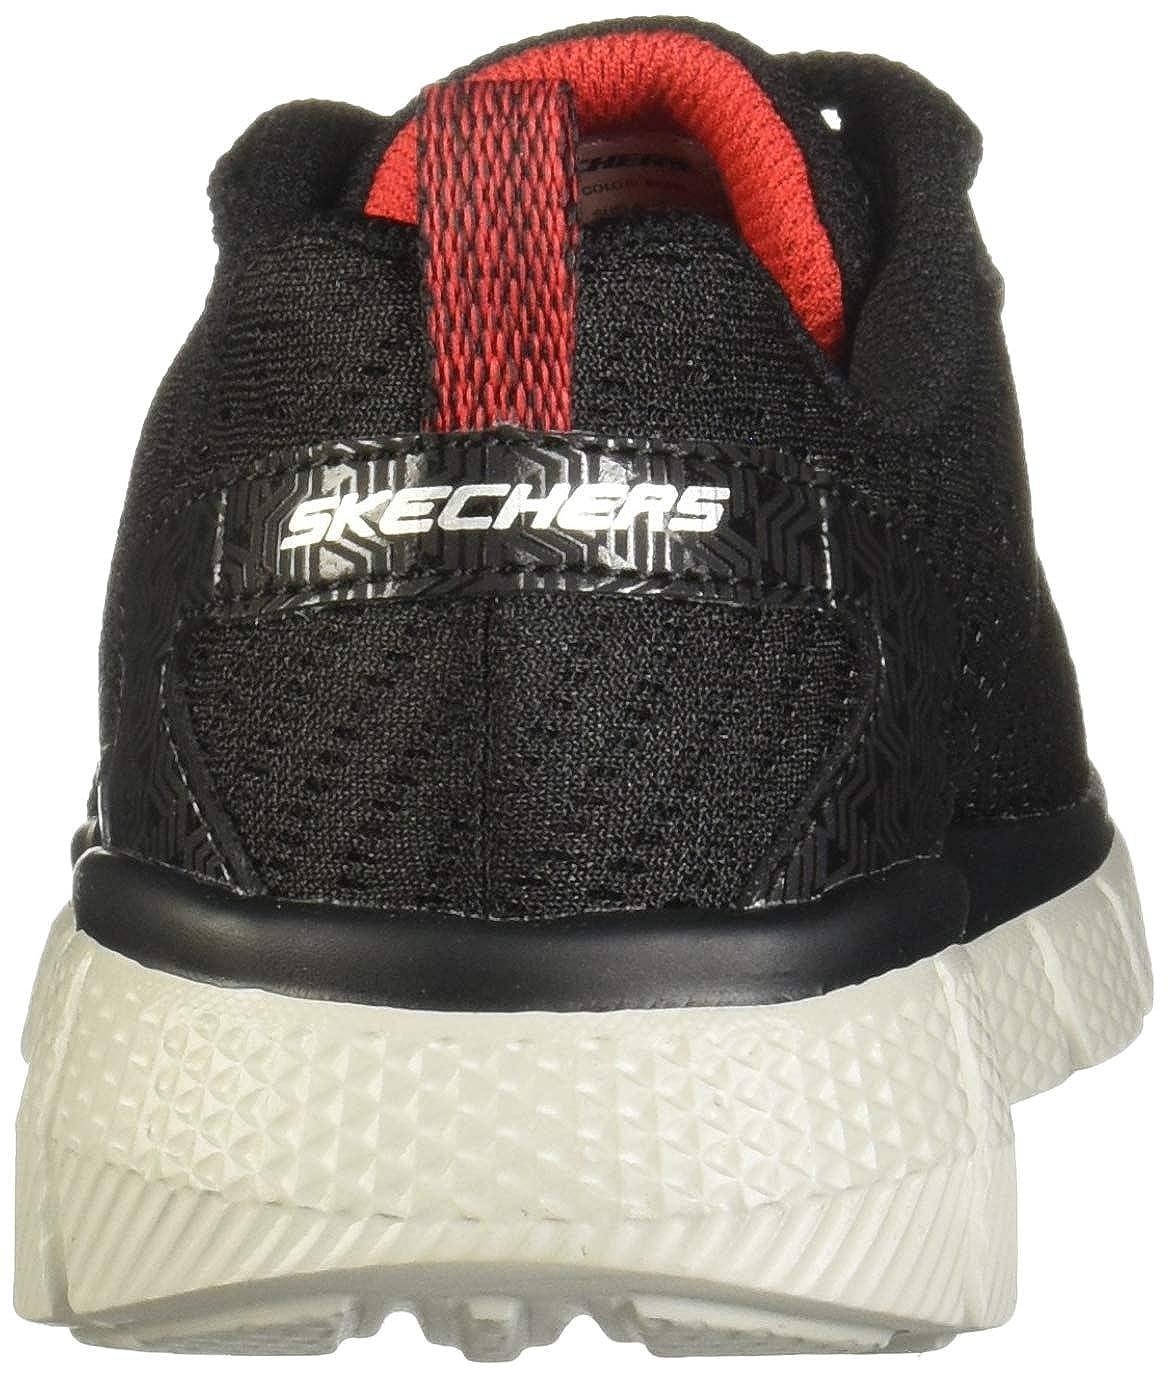 Skechers Kid Equalizer 2.0 Settle The Score Sneakers 97371L-BKRD Boys Shoes